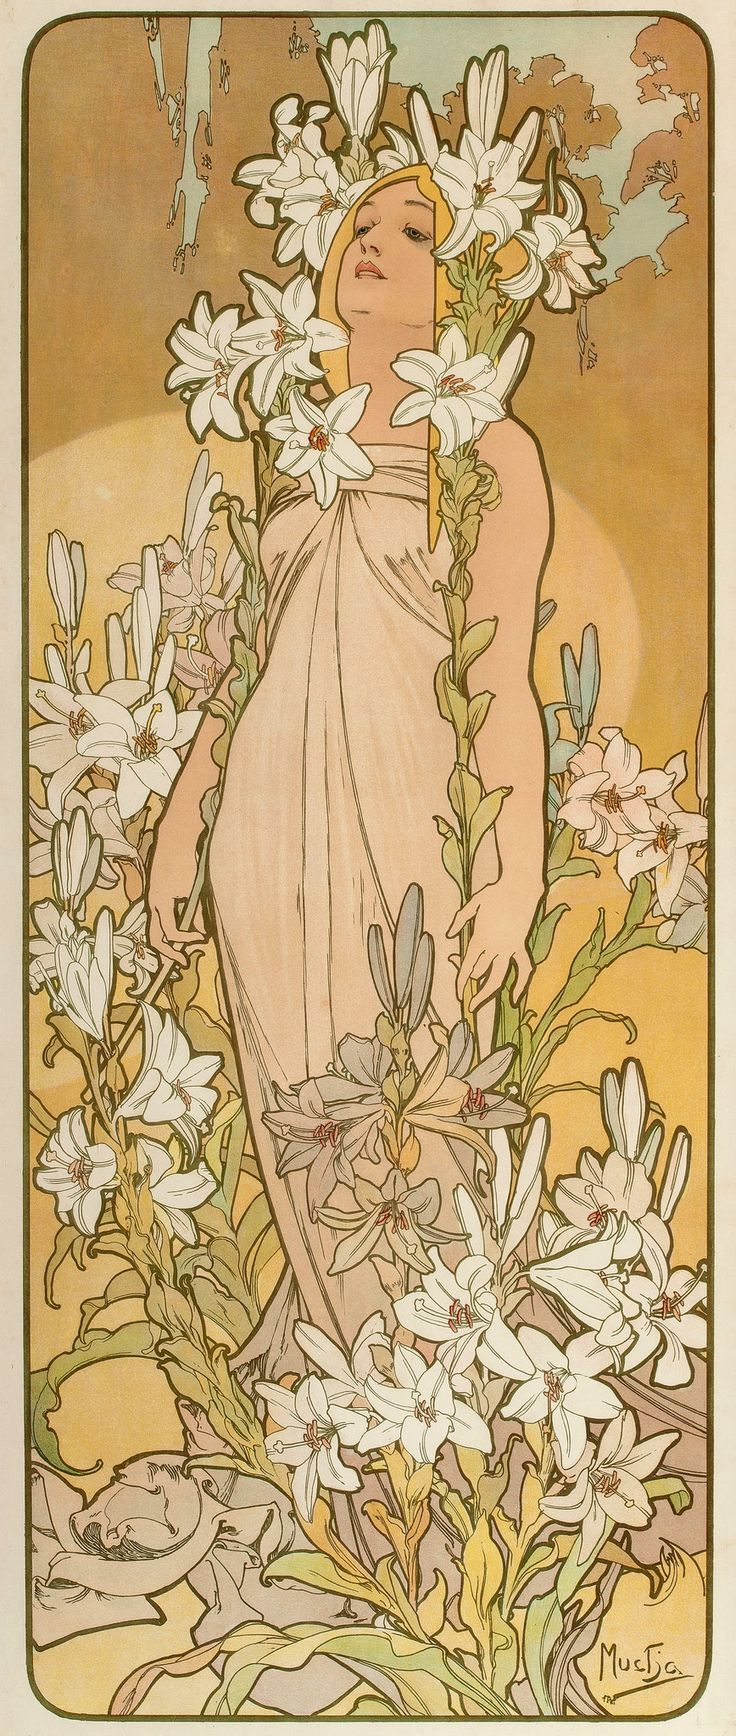 """Les Fleurs - The Lily"" ~ Alphonse Mucha, 1898"